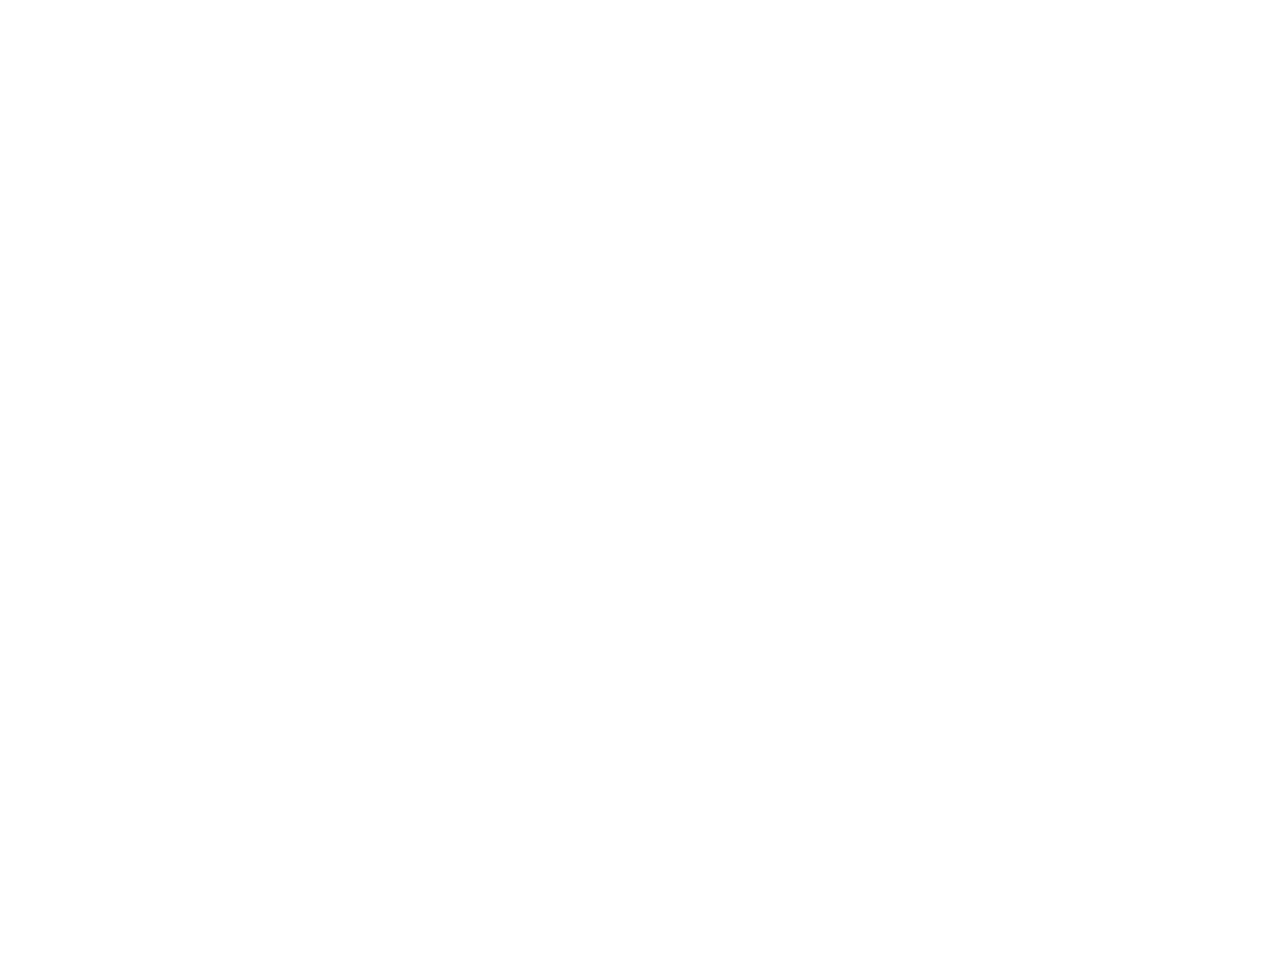 Parete con caratteri cinesi, tempio di Lingyin